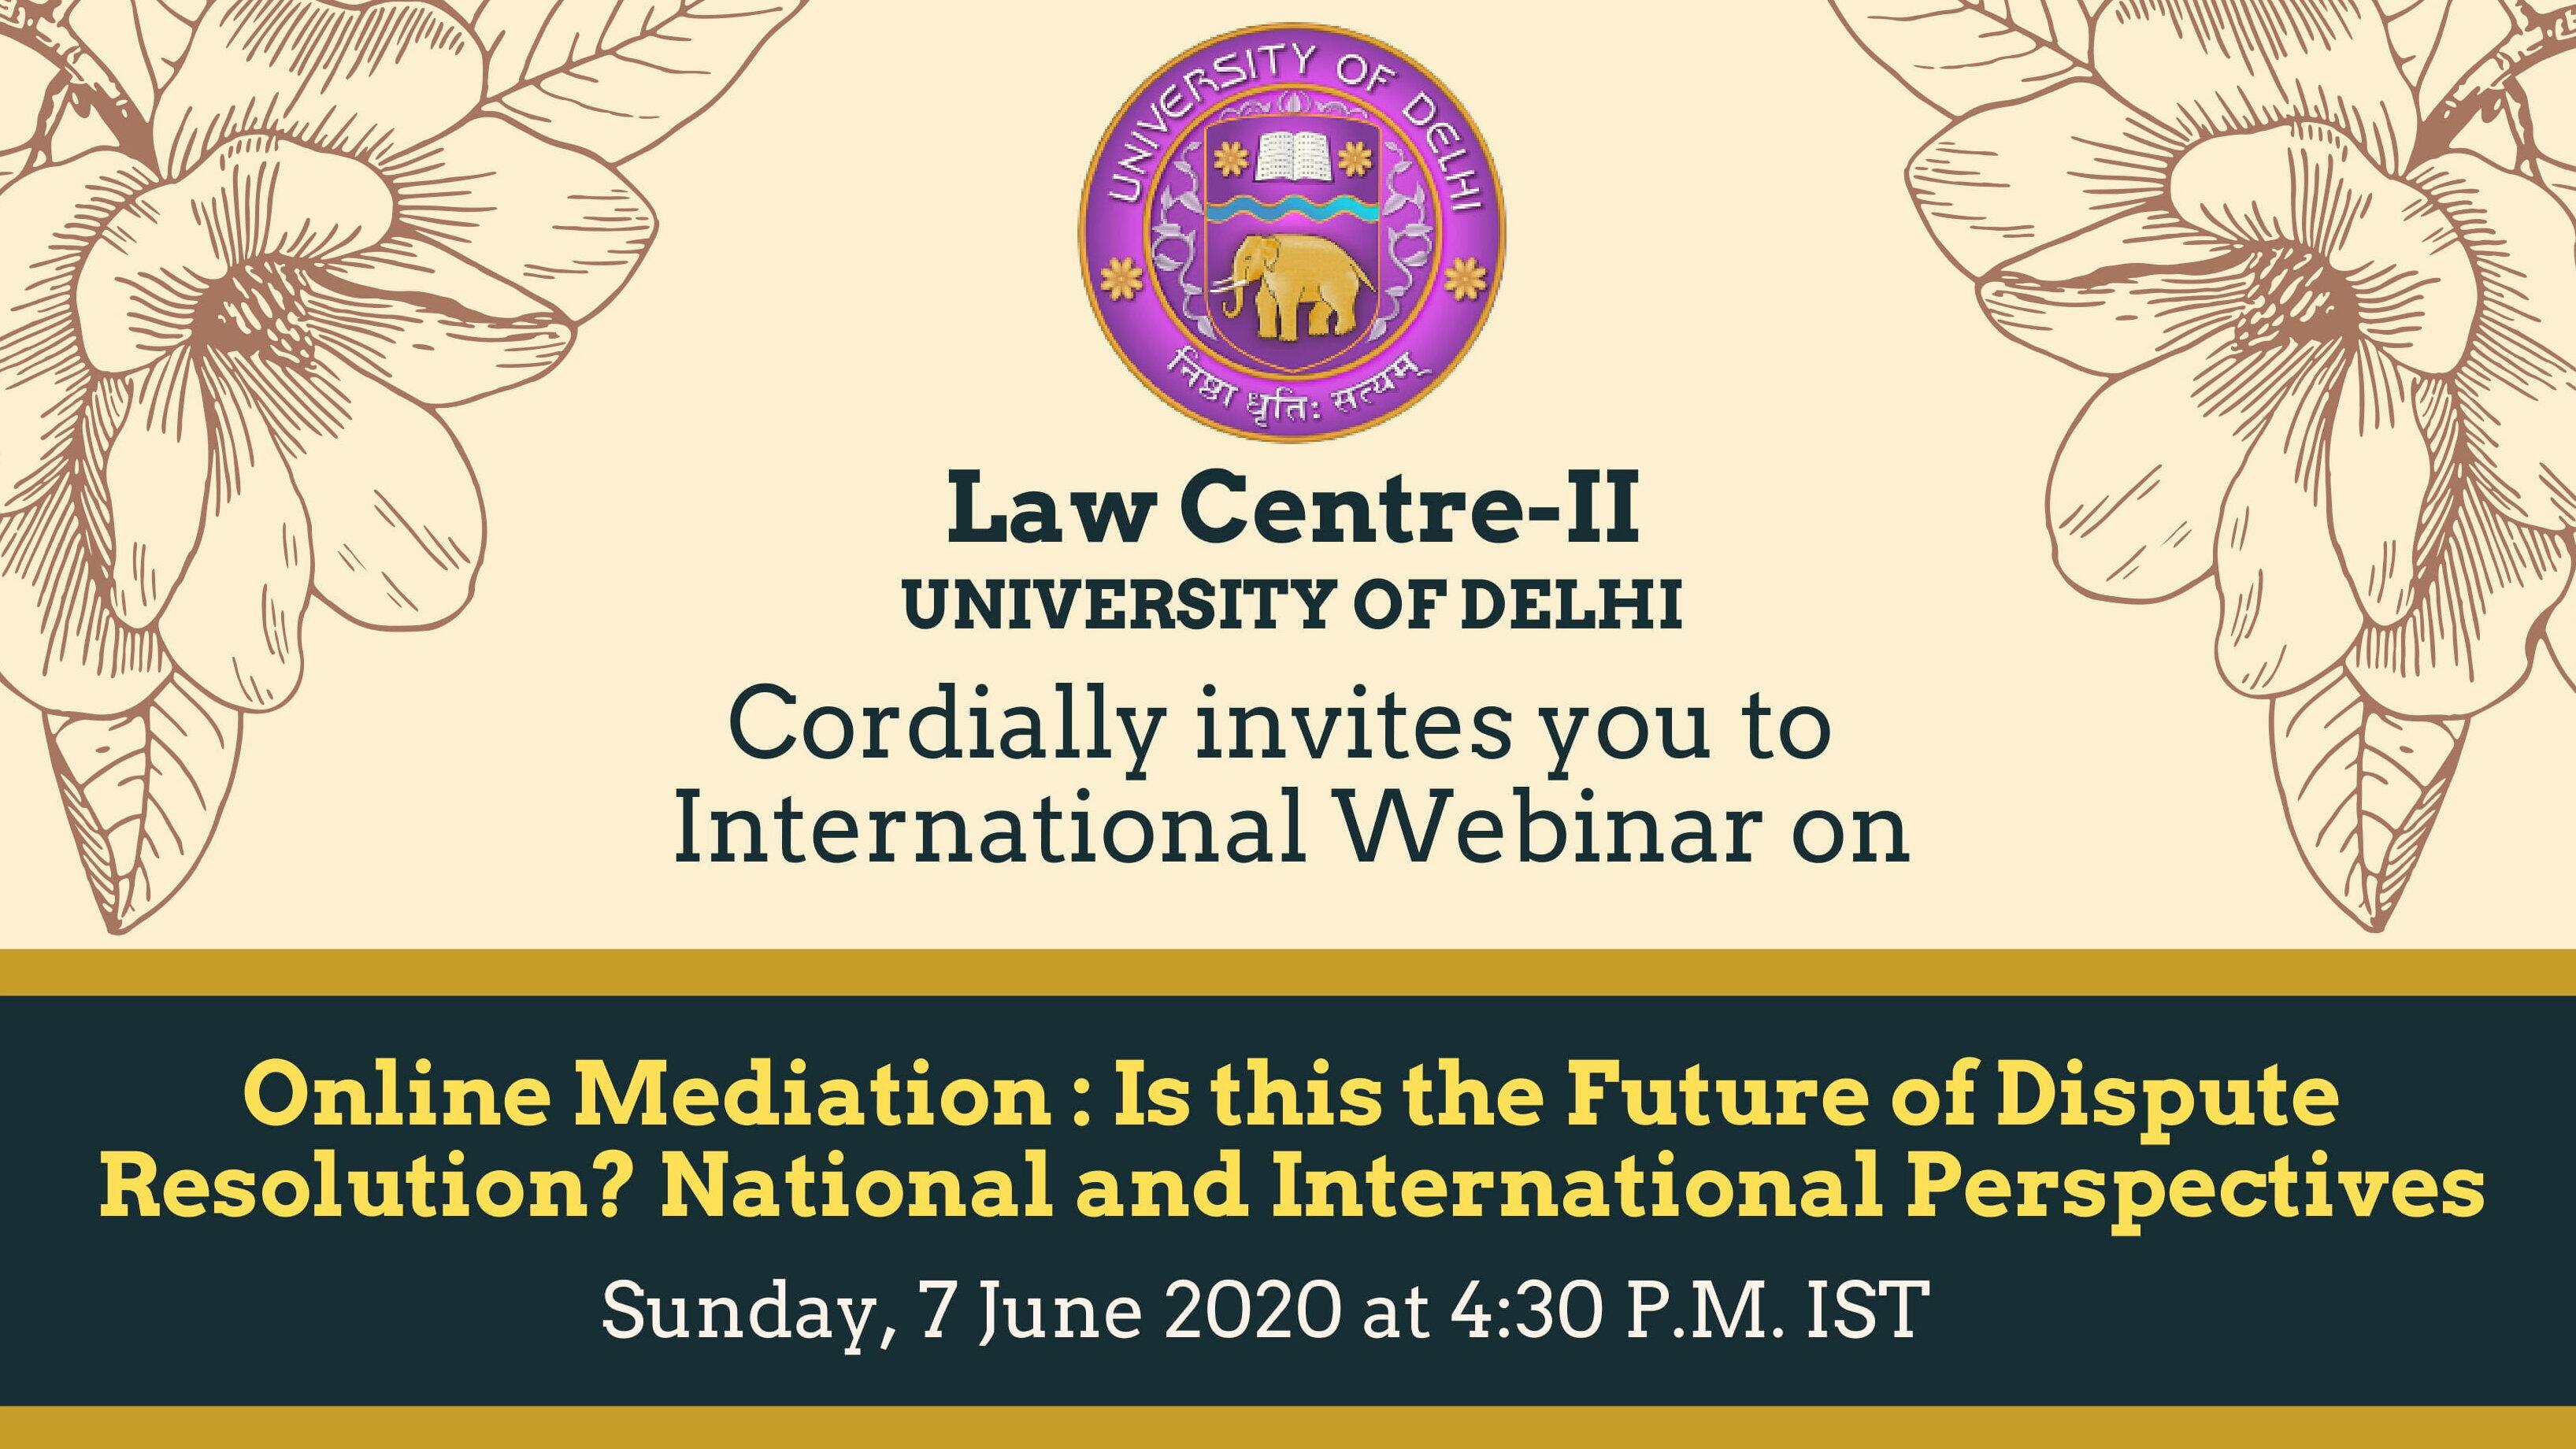 LC-II International Webinar: Online Mediation As The Future Of Dispute Resolution? [Read Brochure]